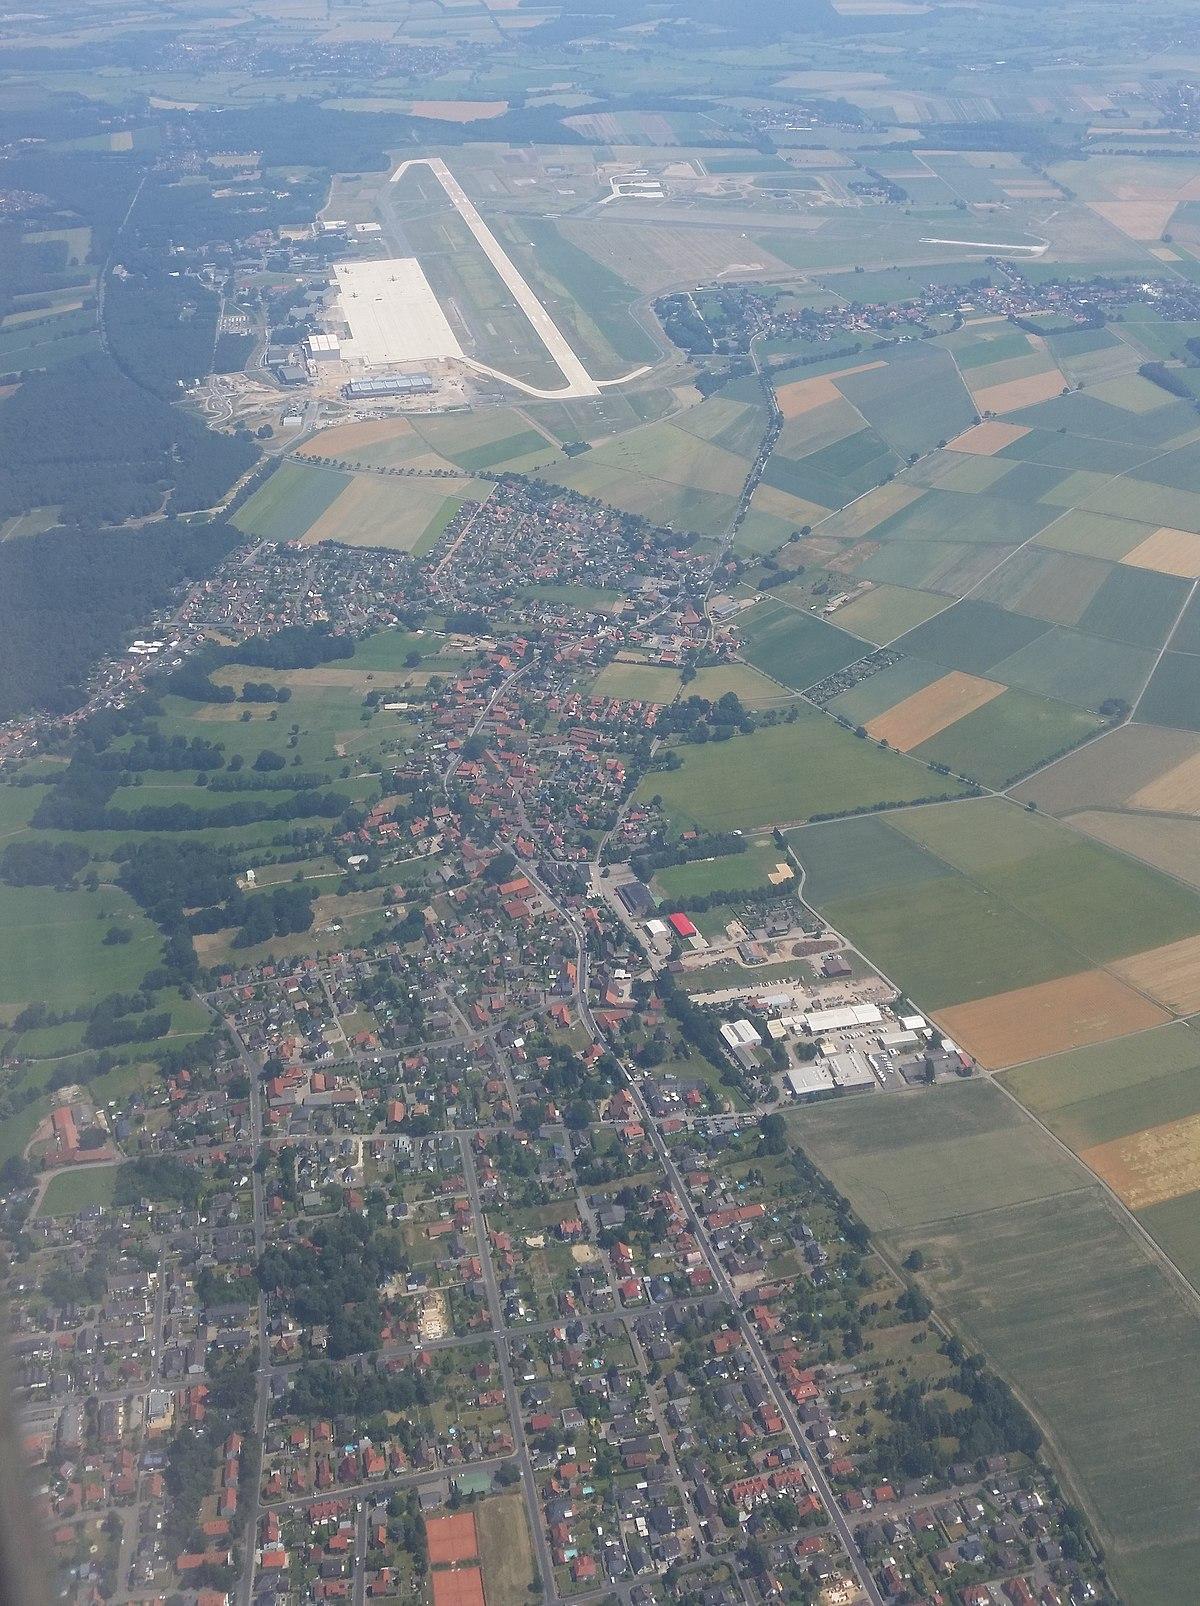 Flugplatz Wunstorf